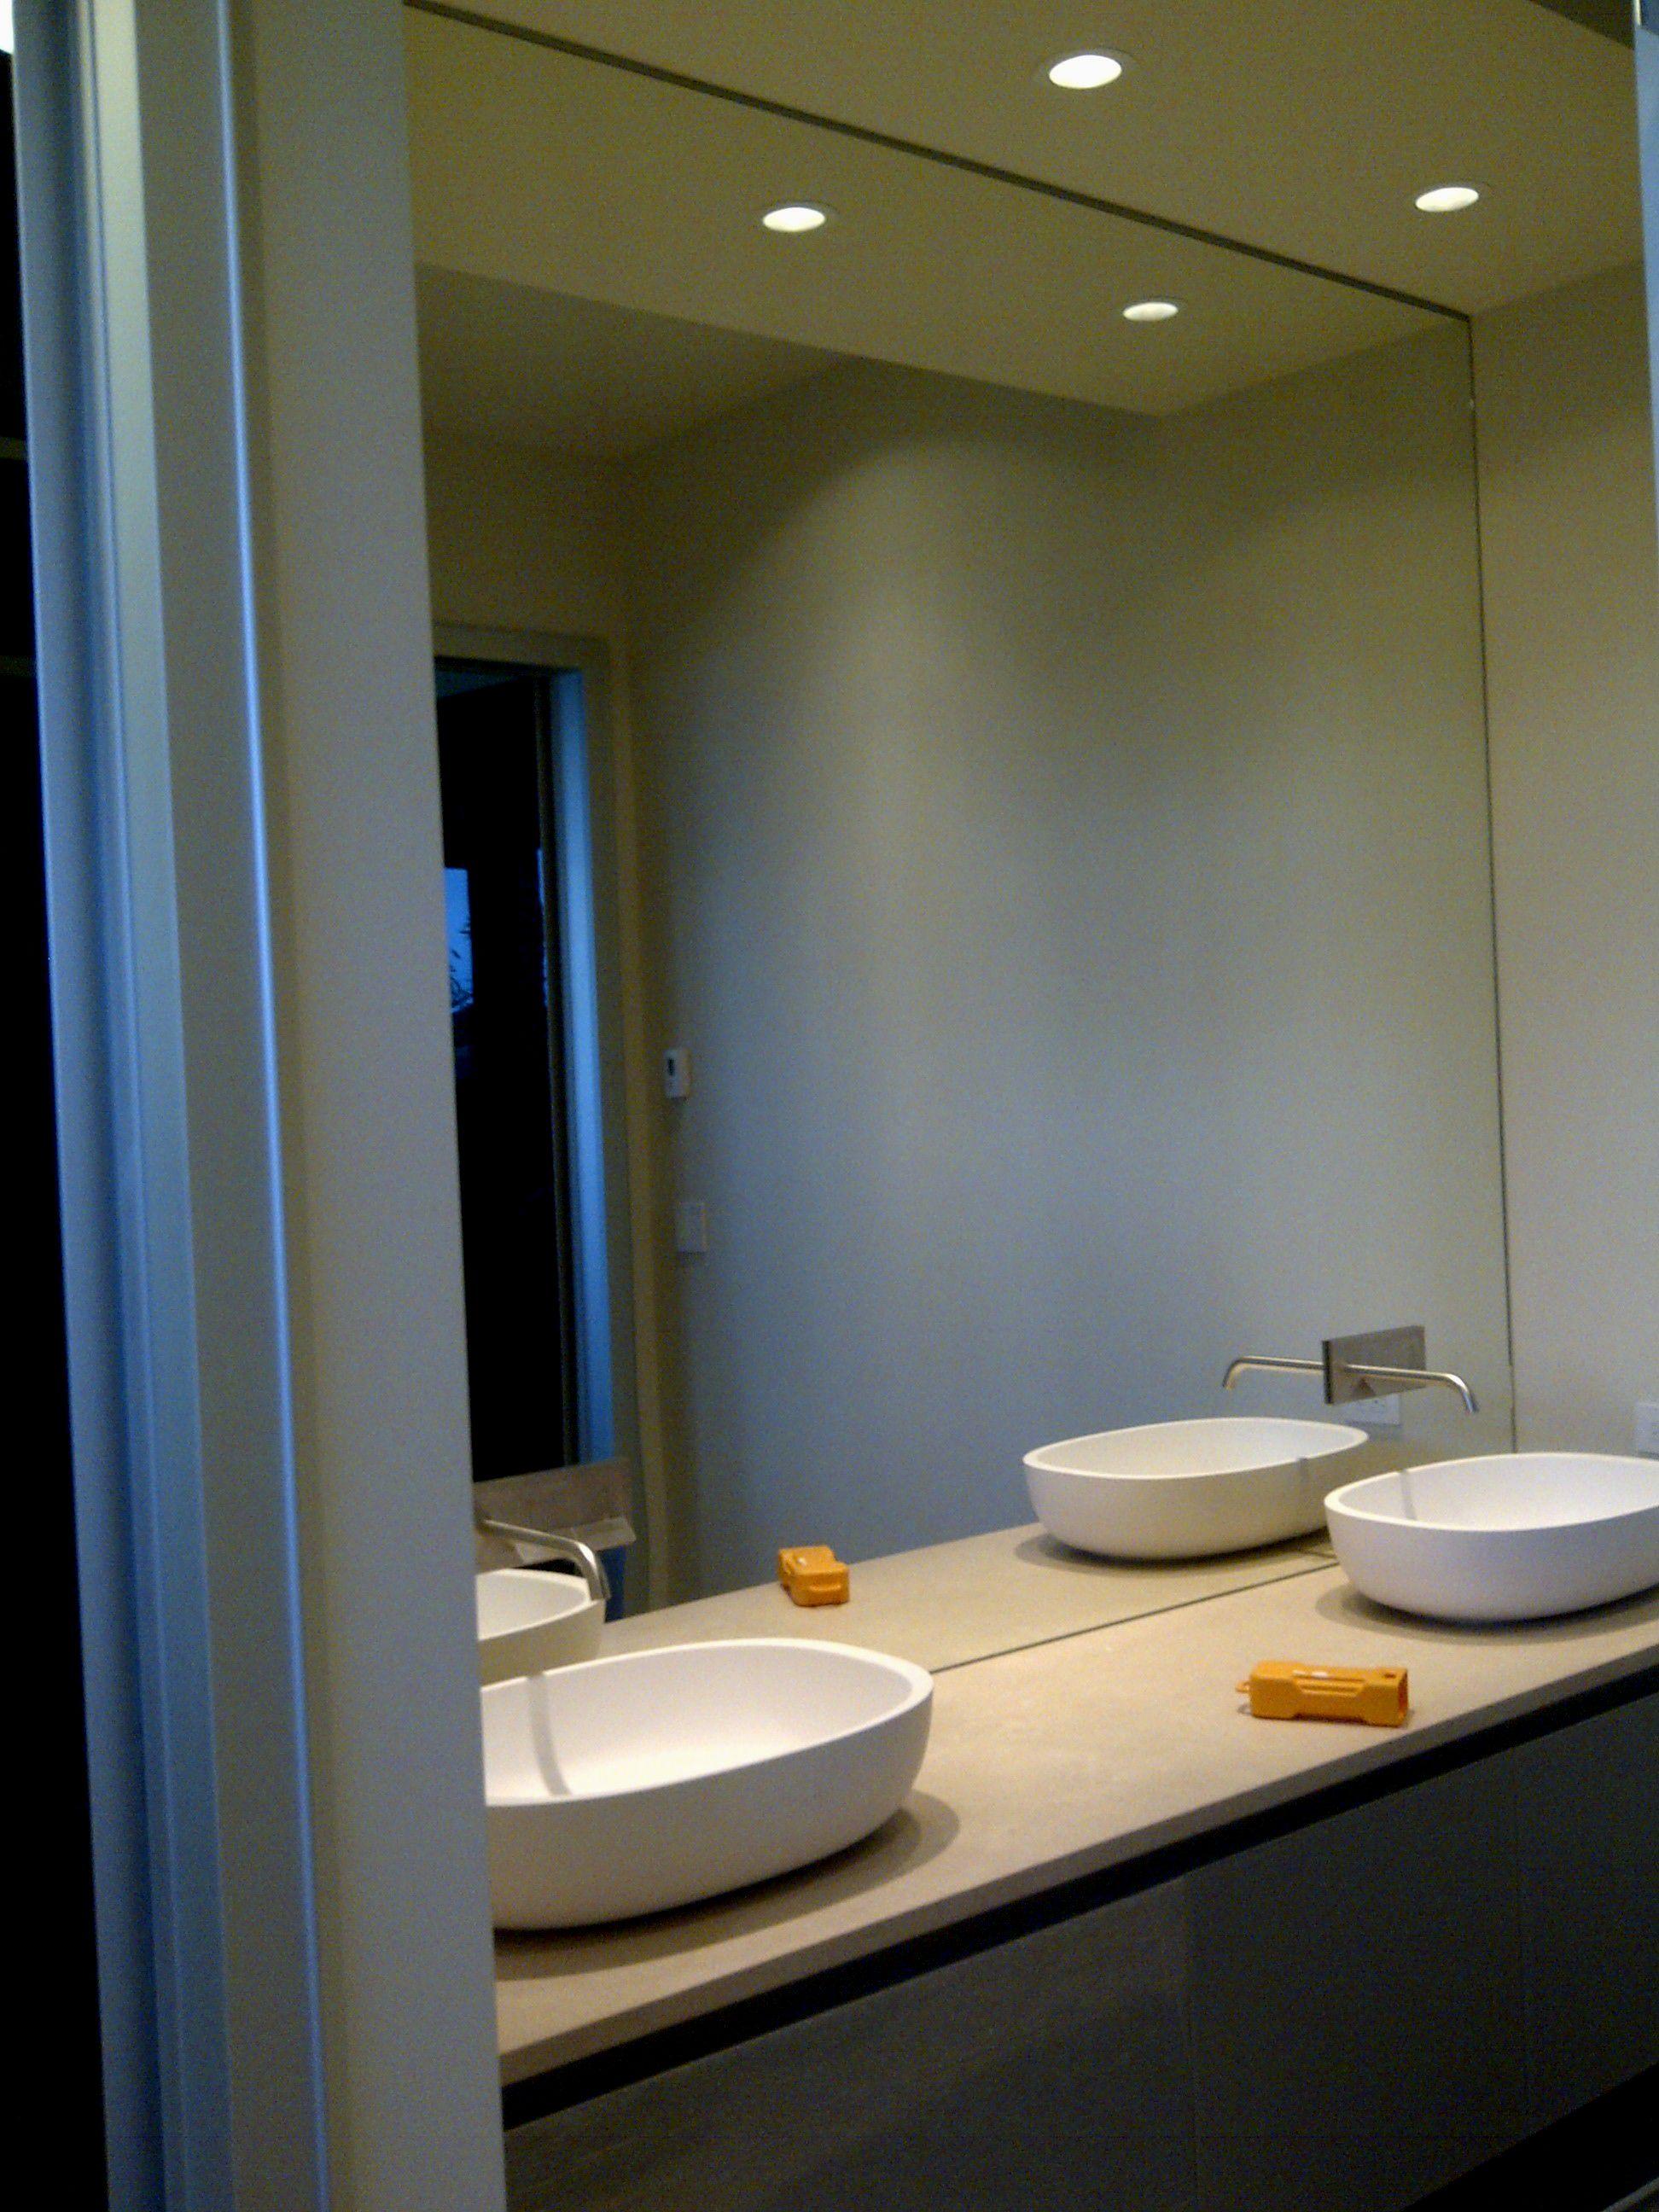 superb white tile bathroom floor décor-Excellent White Tile Bathroom Floor Pattern